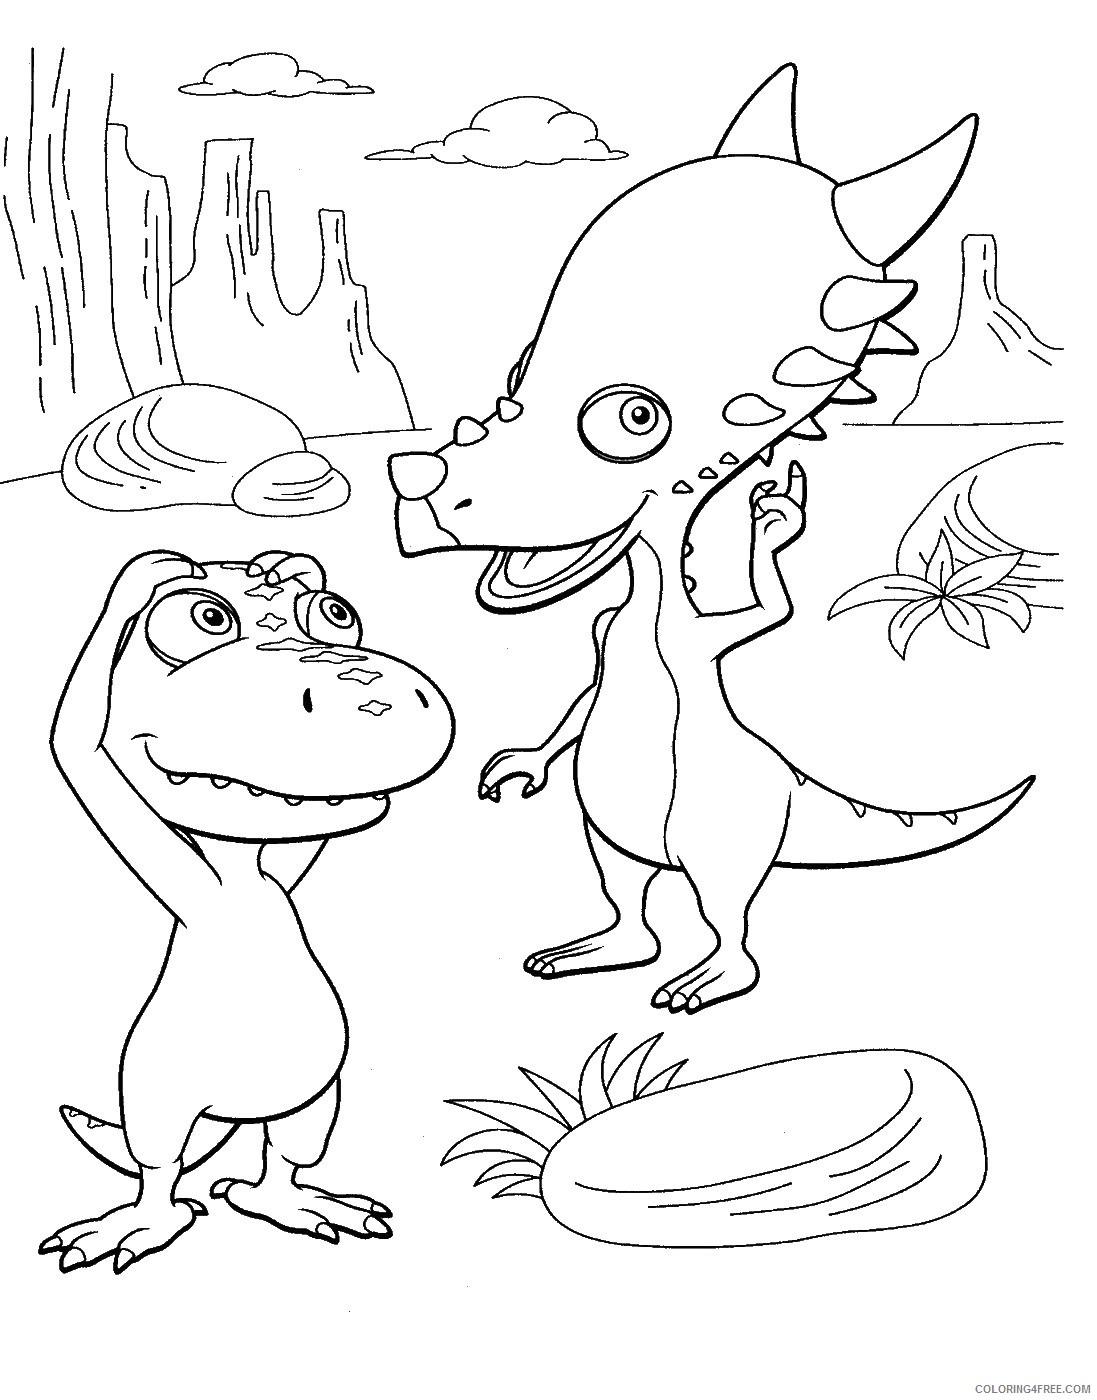 Dinosaur Train Coloring Pages Cartoons Dino Train 71 Printable 2020 2206 Coloring4free Coloring4free Com